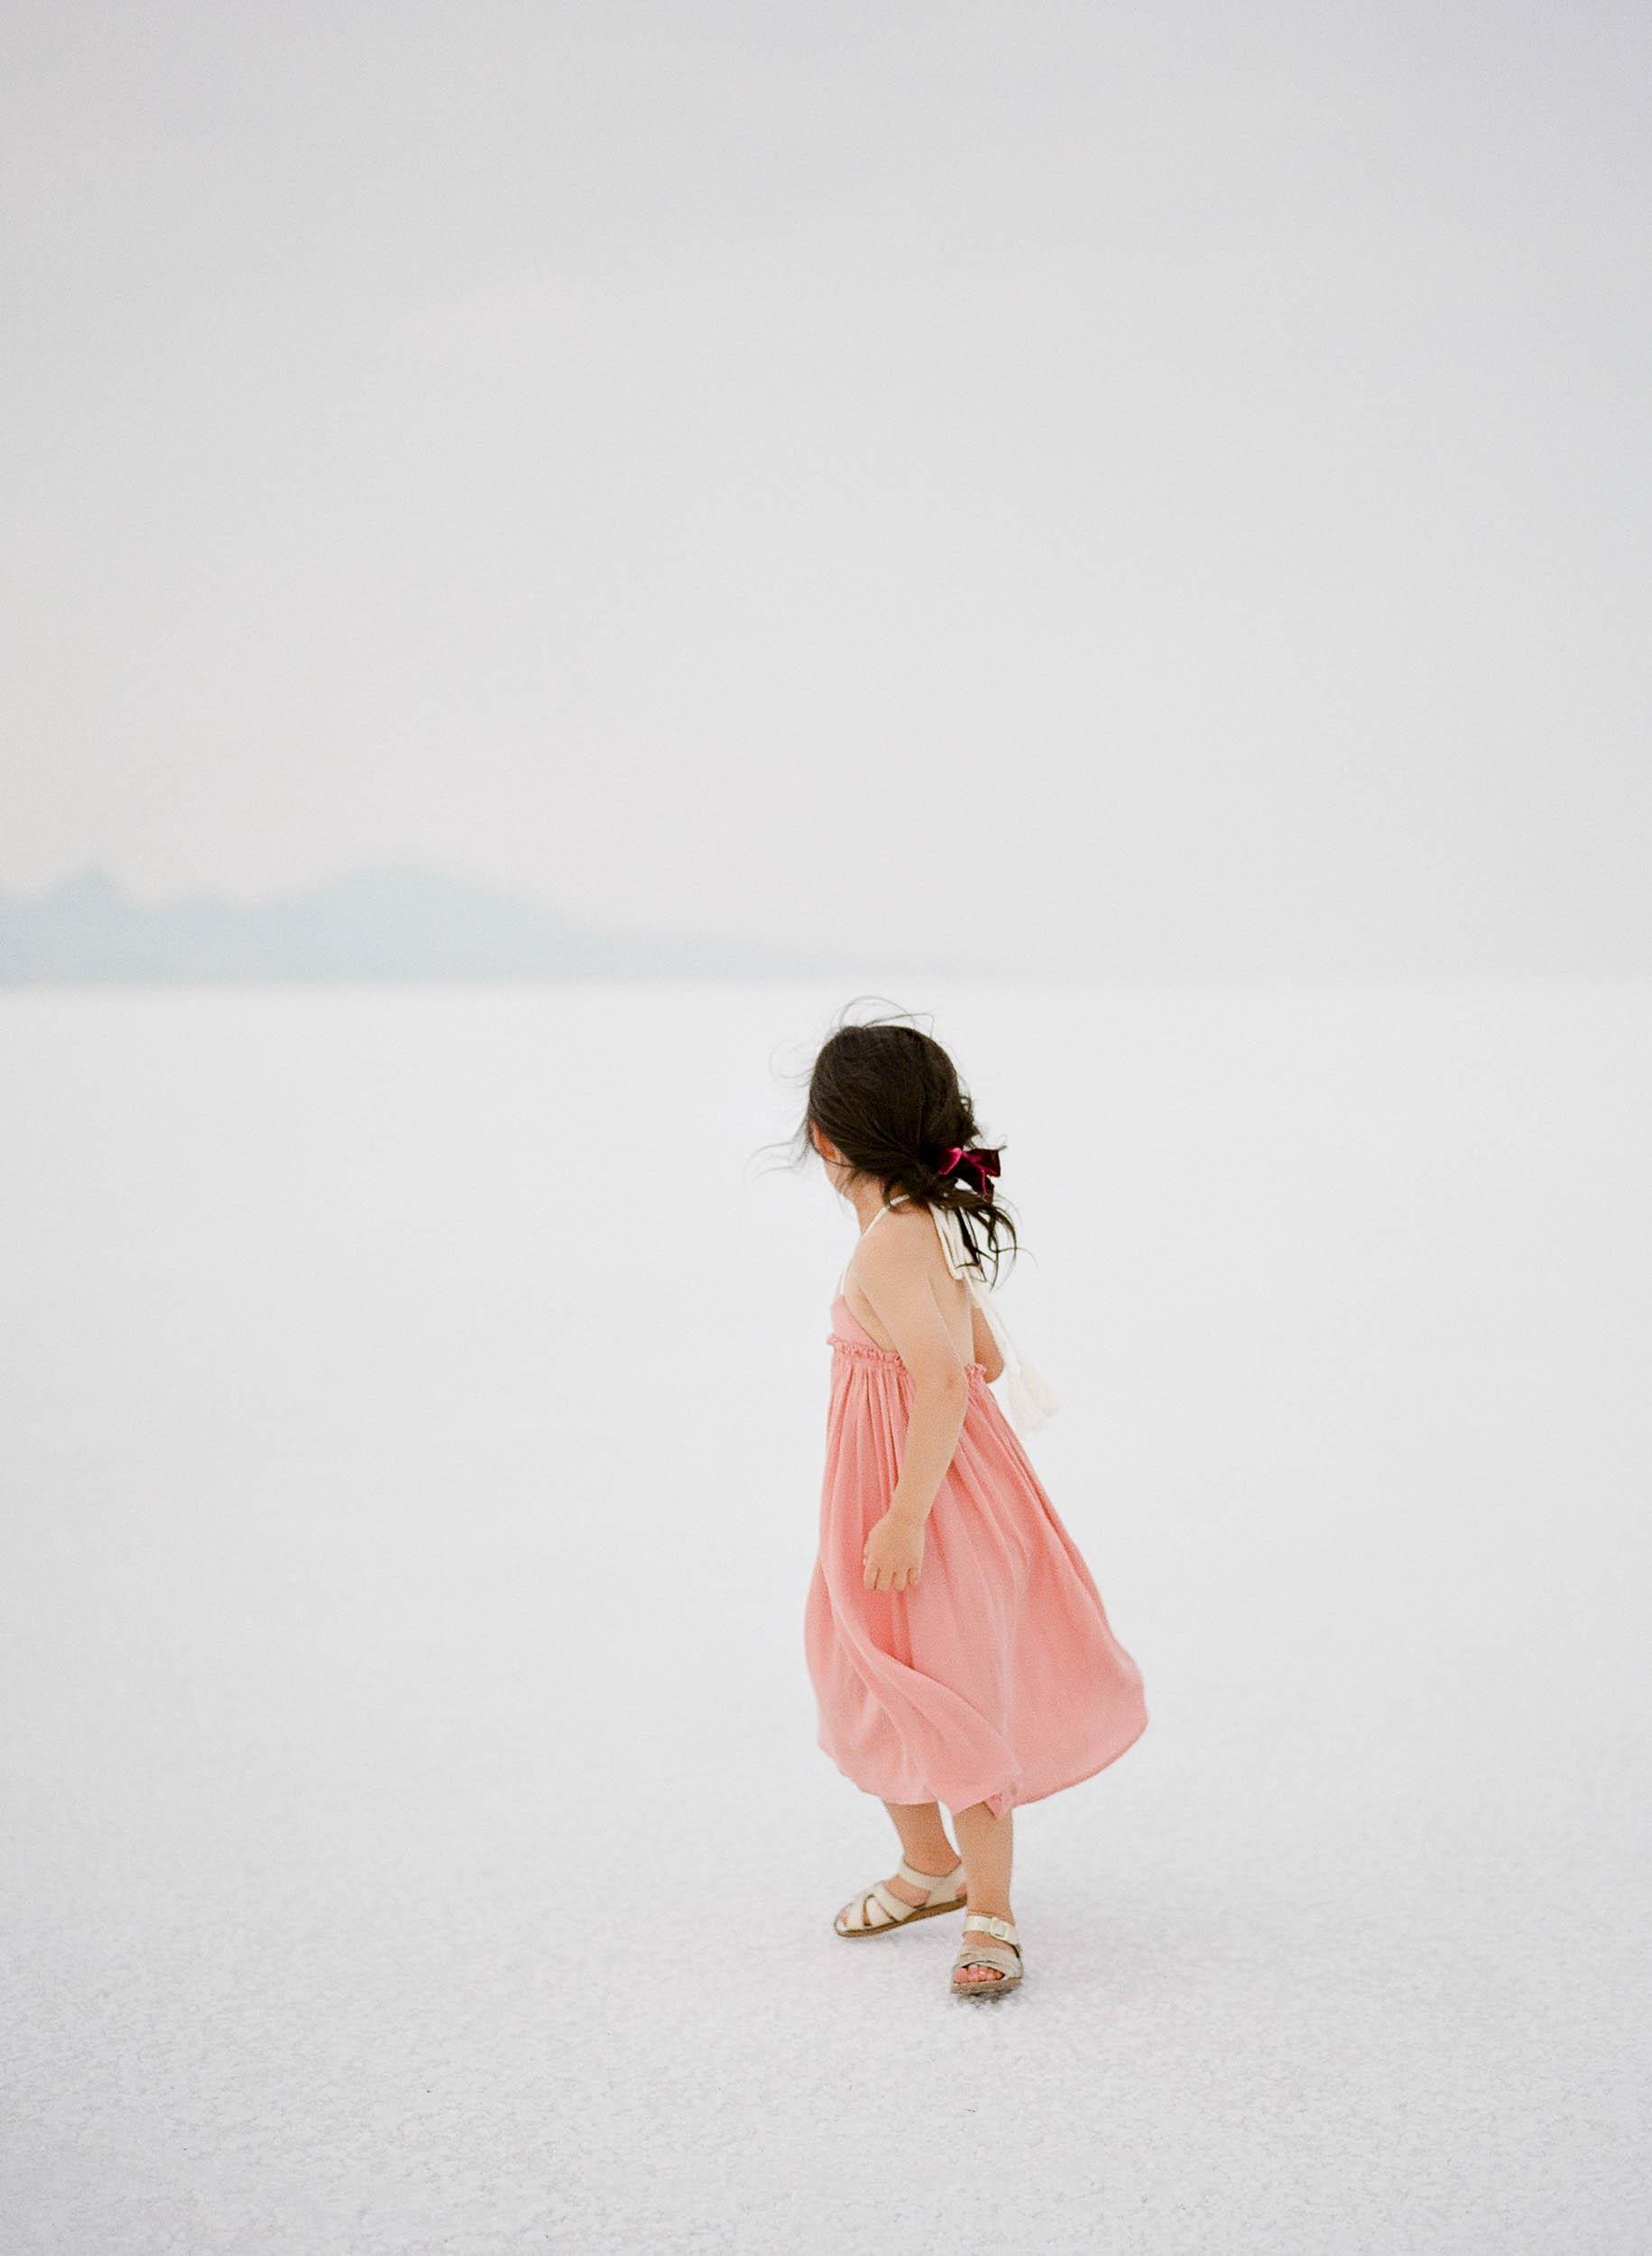 070918_Sandy A La Mode_Family_Utah Salt Flats_Buena Lane Photography_F400_29.jpg